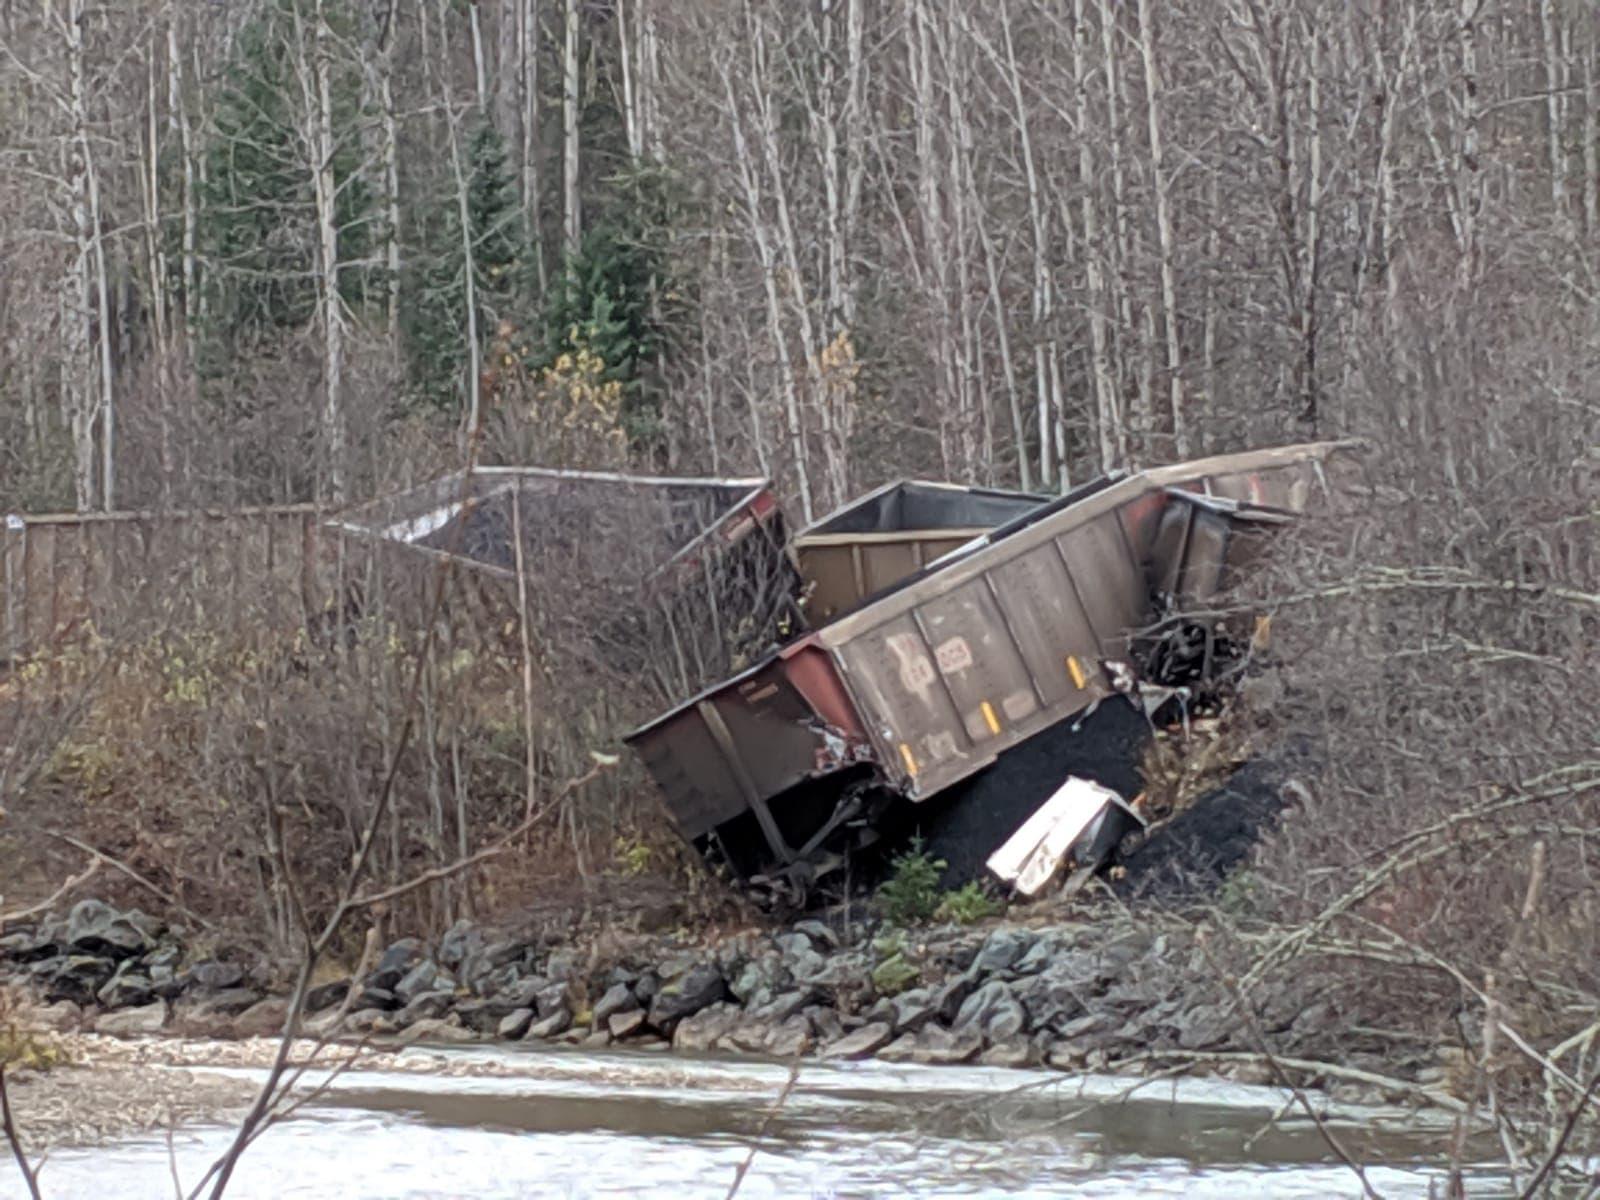 18 train cars derail west of McBride